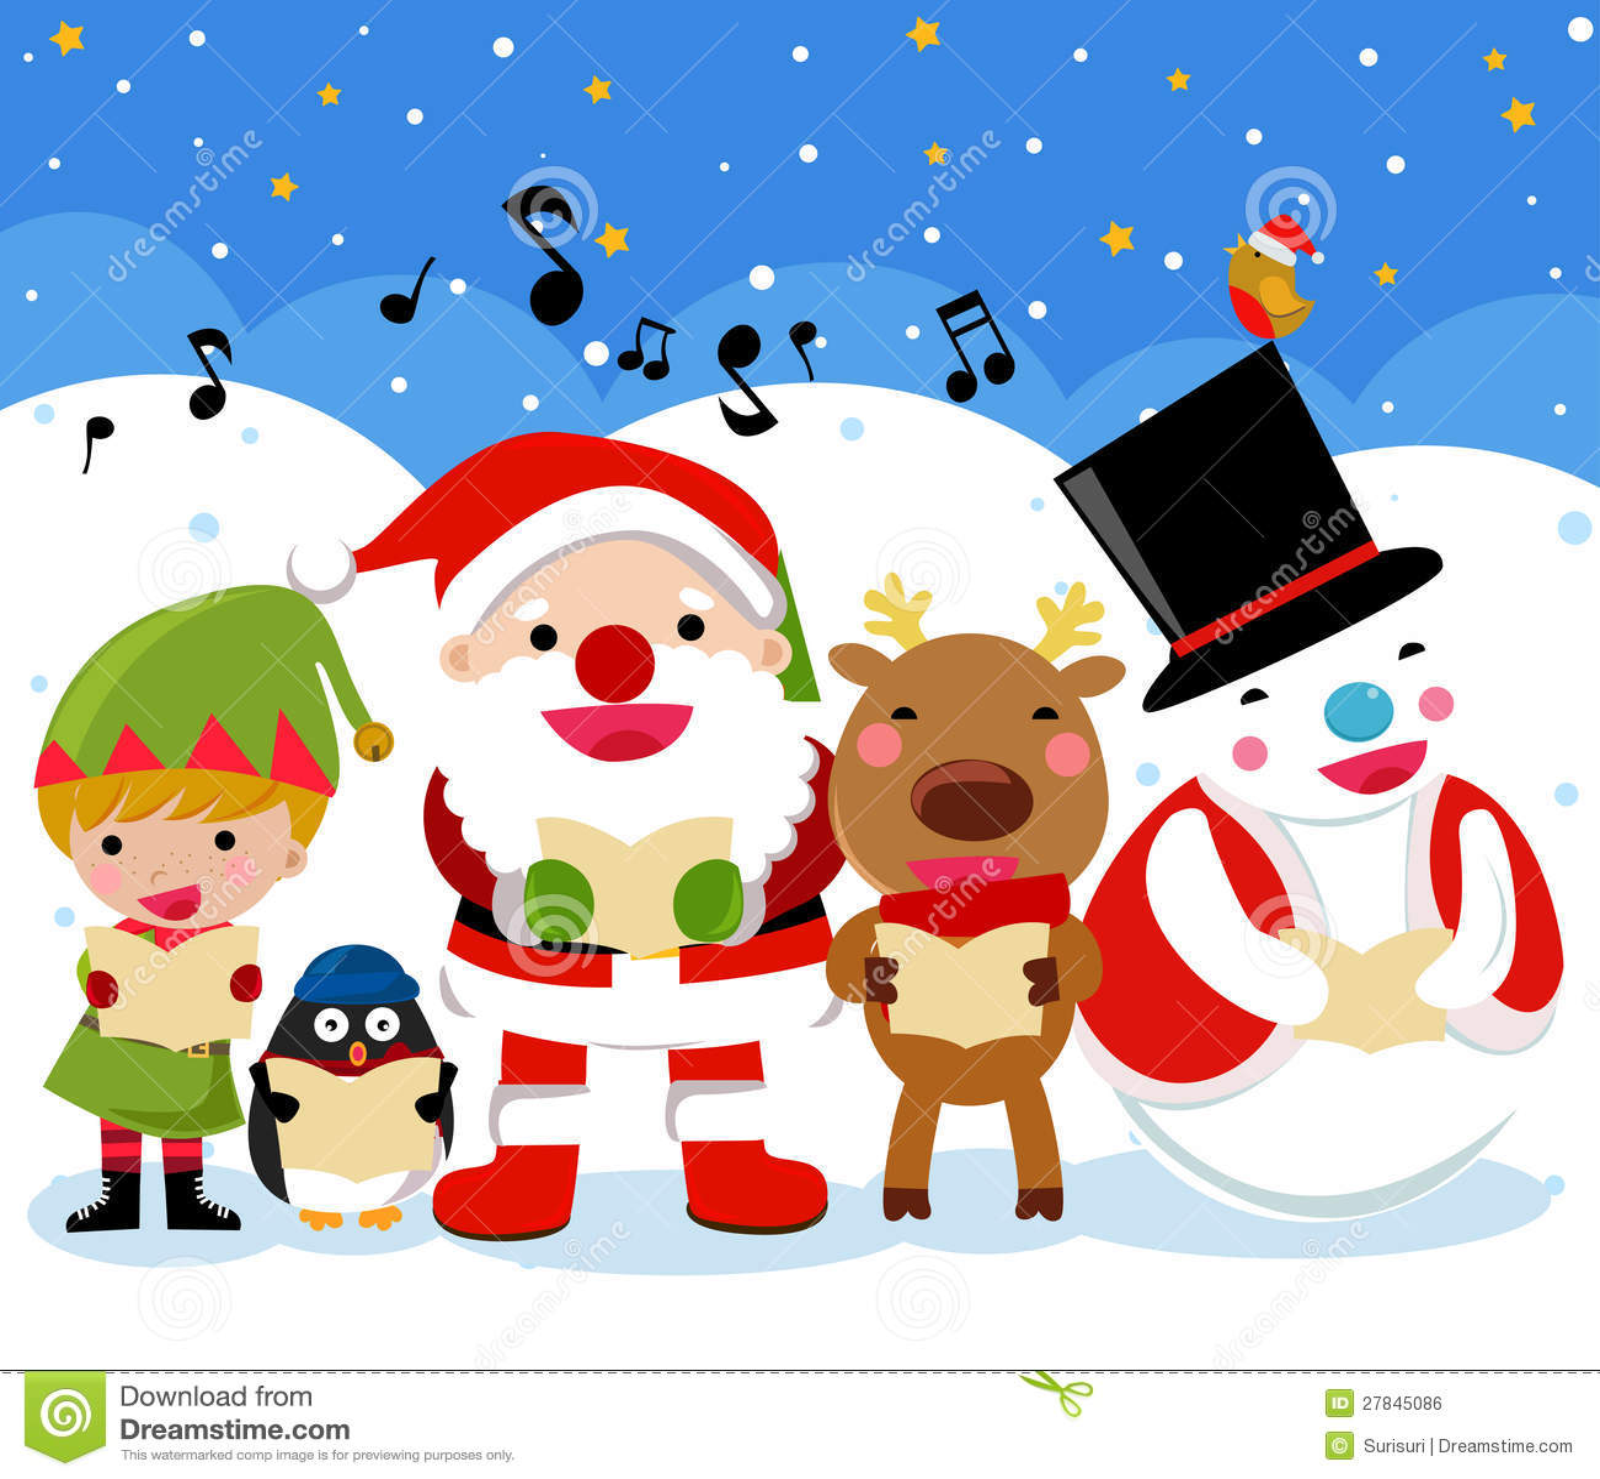 santa reindeer snow man elf and penguin christmas royalty free